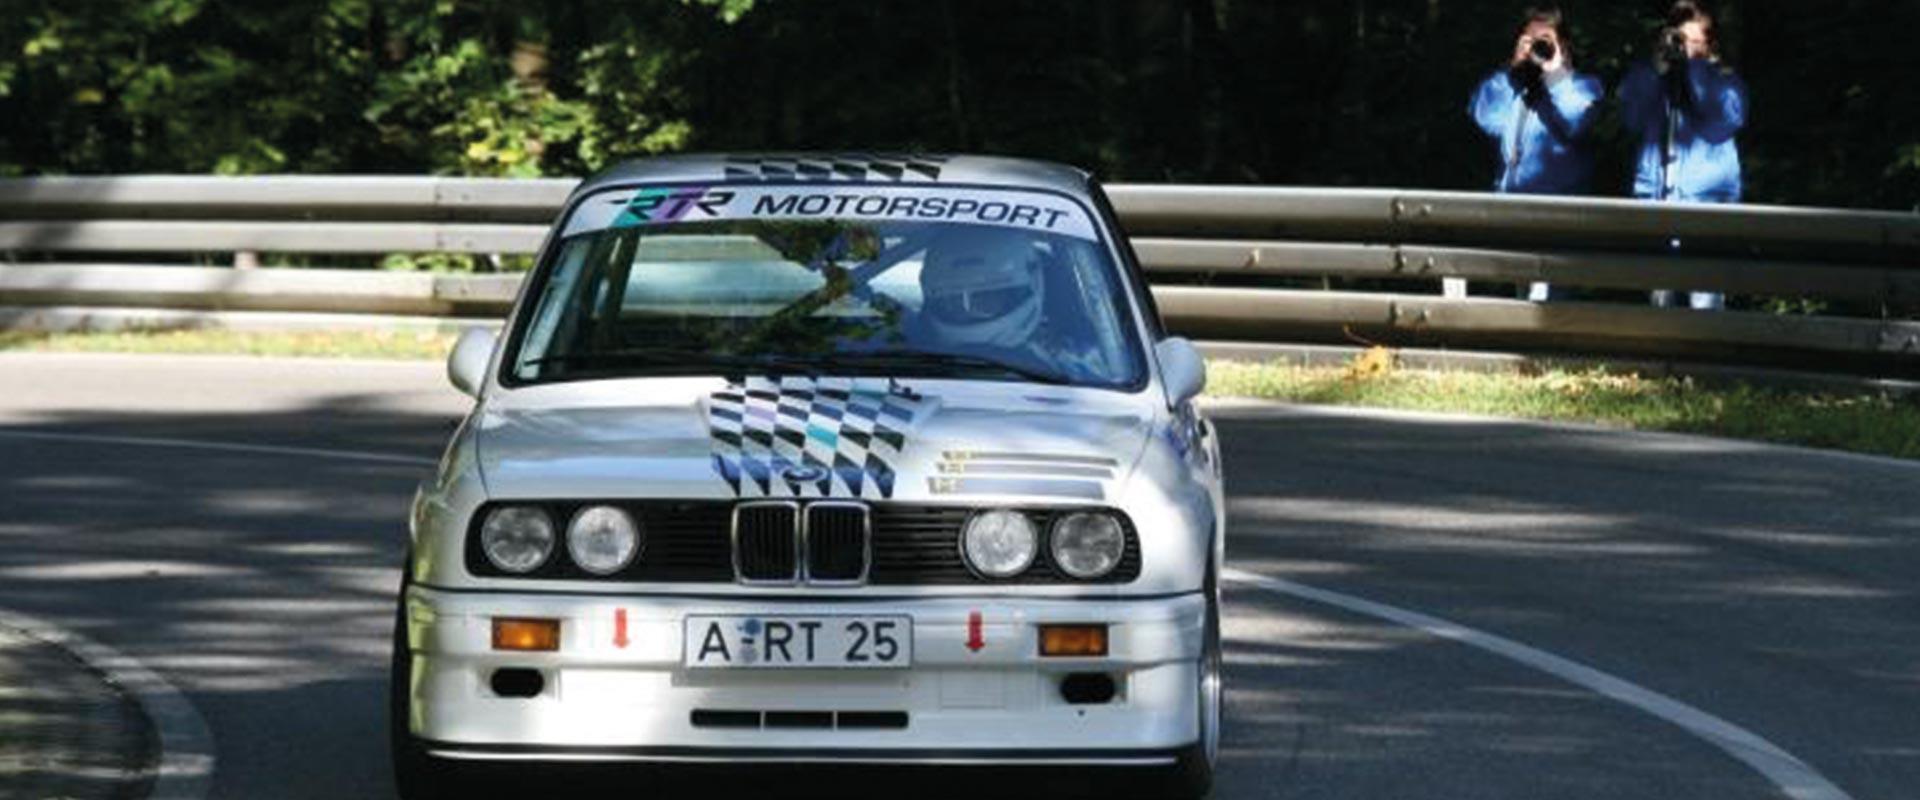 Robert Tögl Motorsport